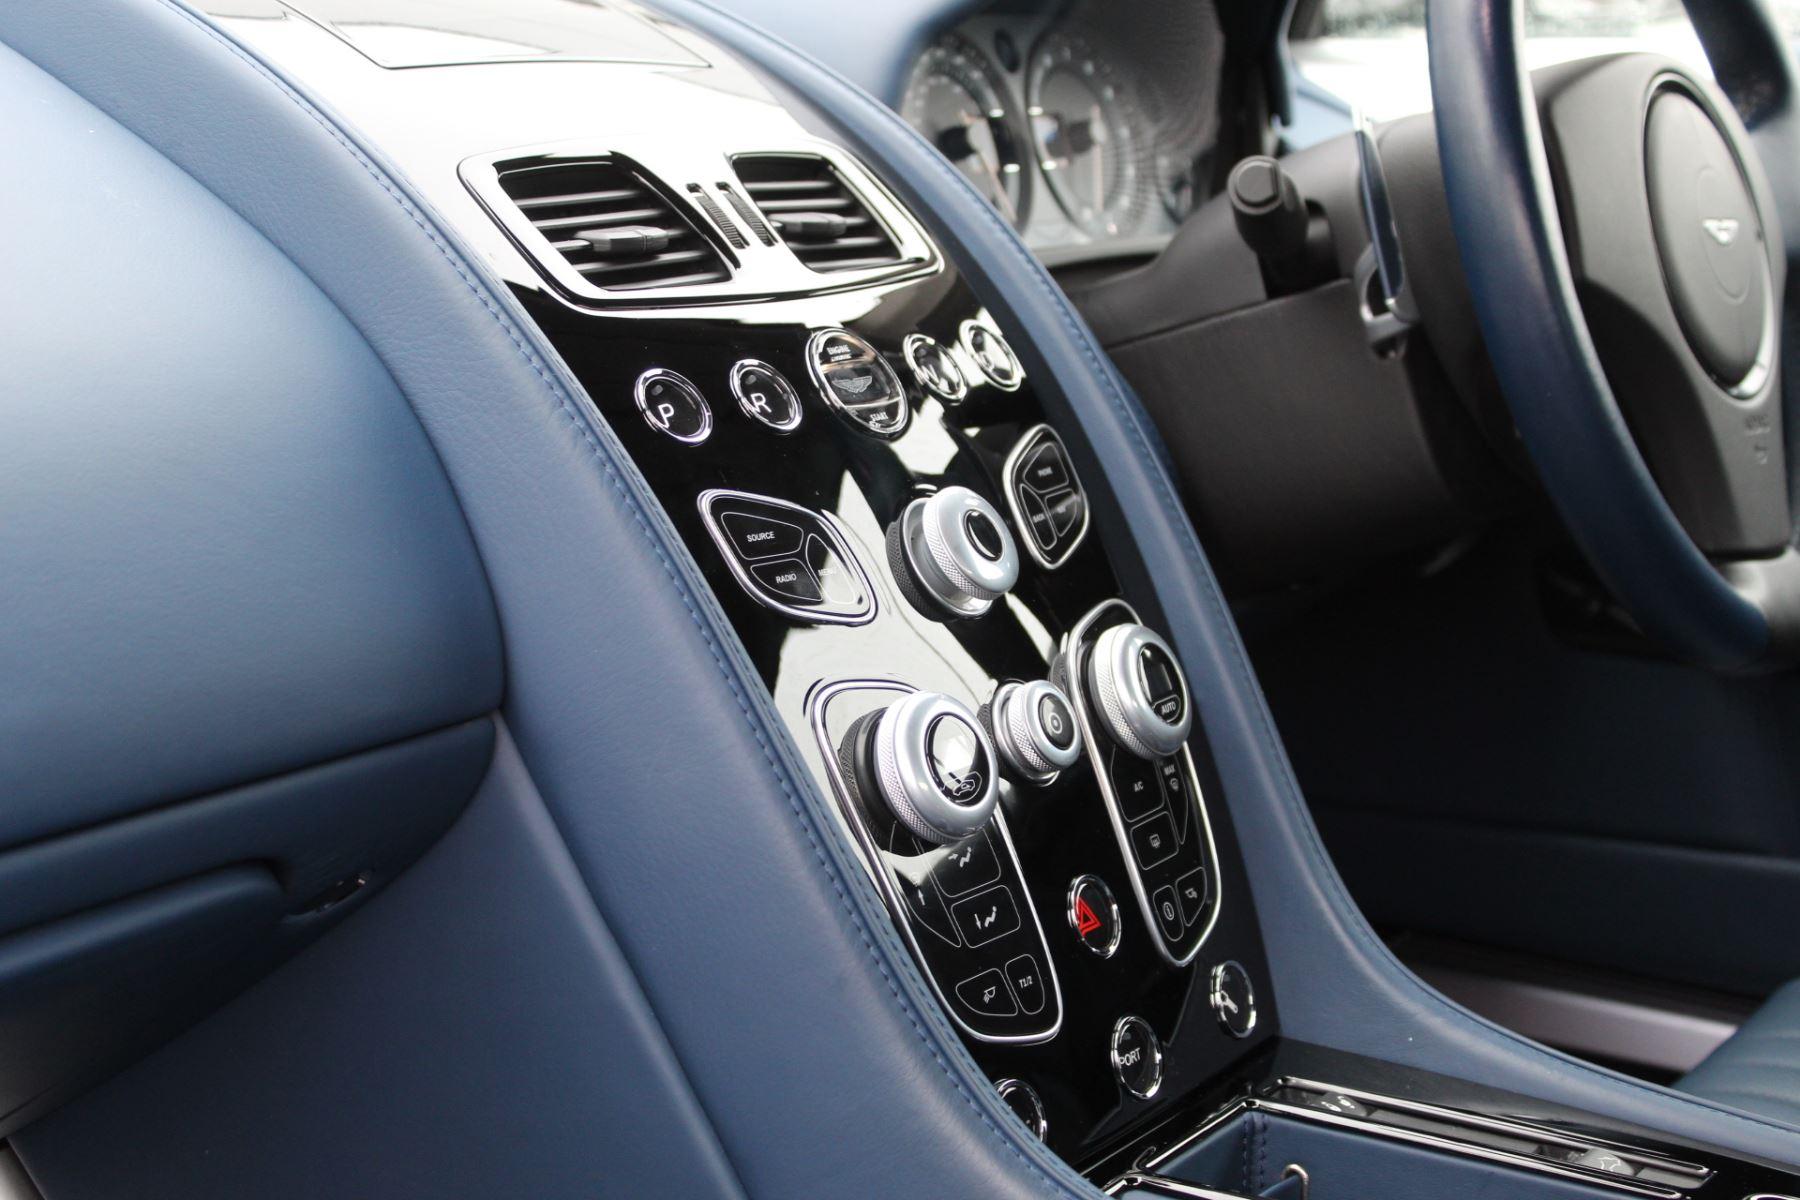 Aston Martin DB9 V12 GT 2dr Volante Touchtronic image 14